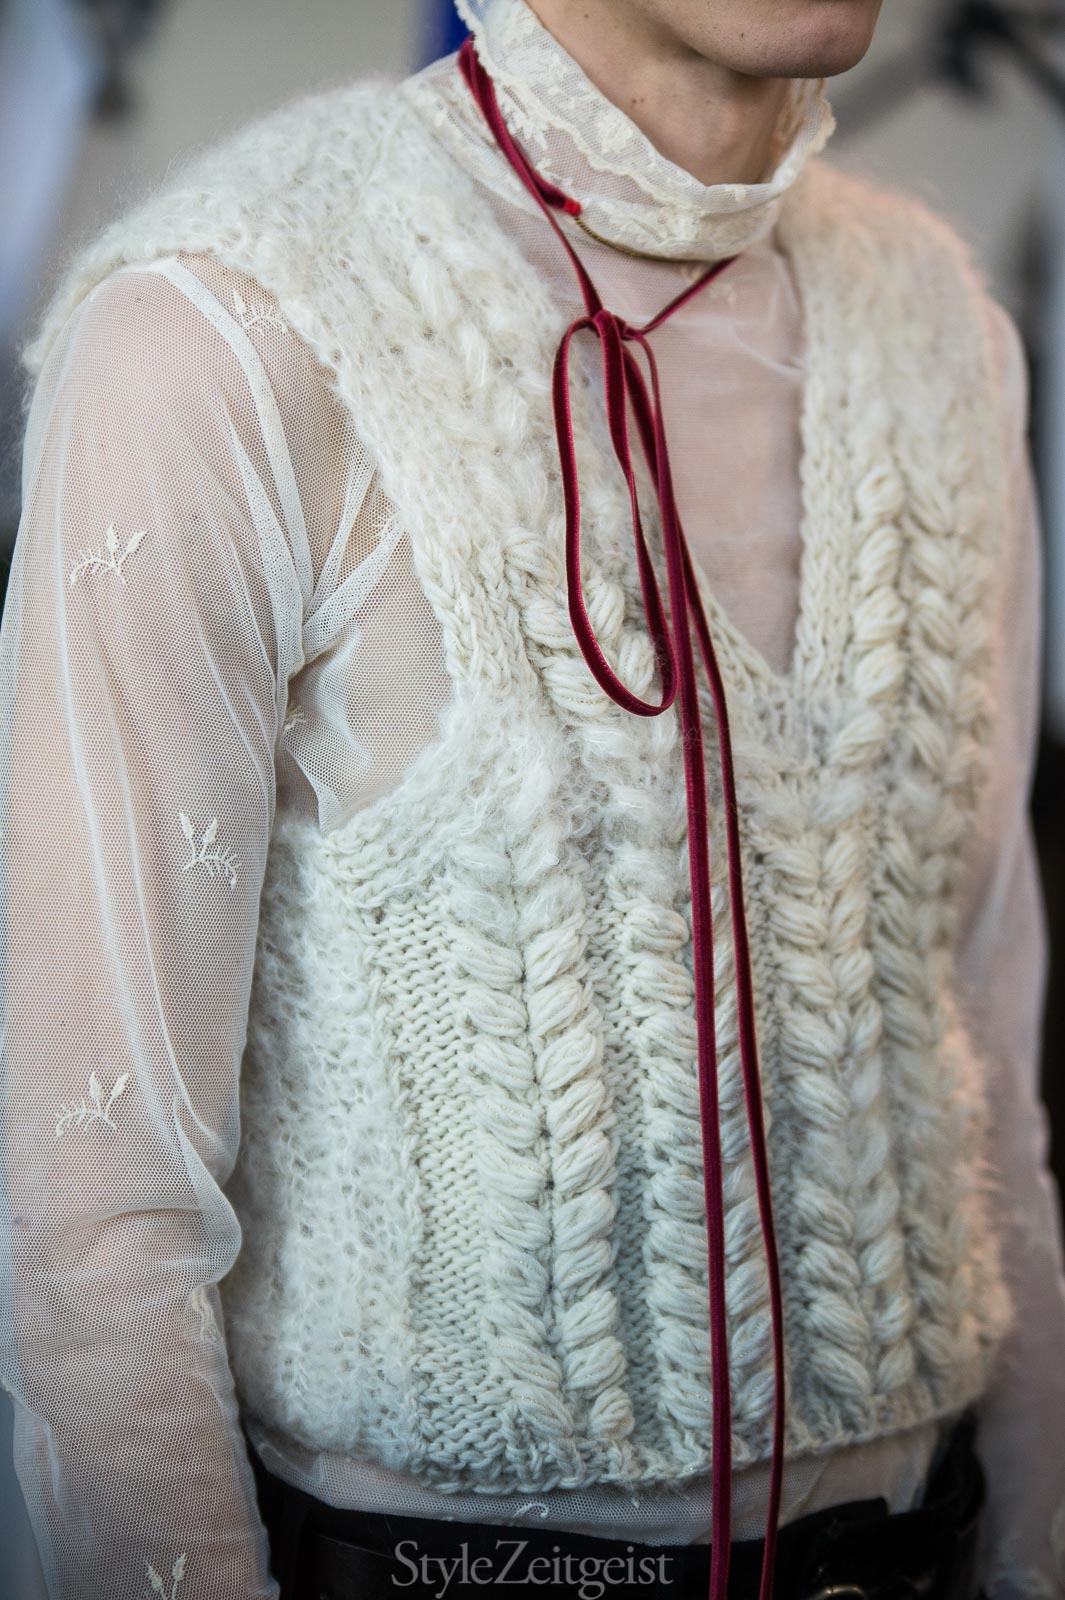 Ann Demeulemeester F/W17 Men's - Paris Backstage - StyleZeitgeist, Patrick LaDuke, Paris, MENSWEAR, FW17, Fashion, Fall Winter, Backstage, Ann Demeulemeester, 2017